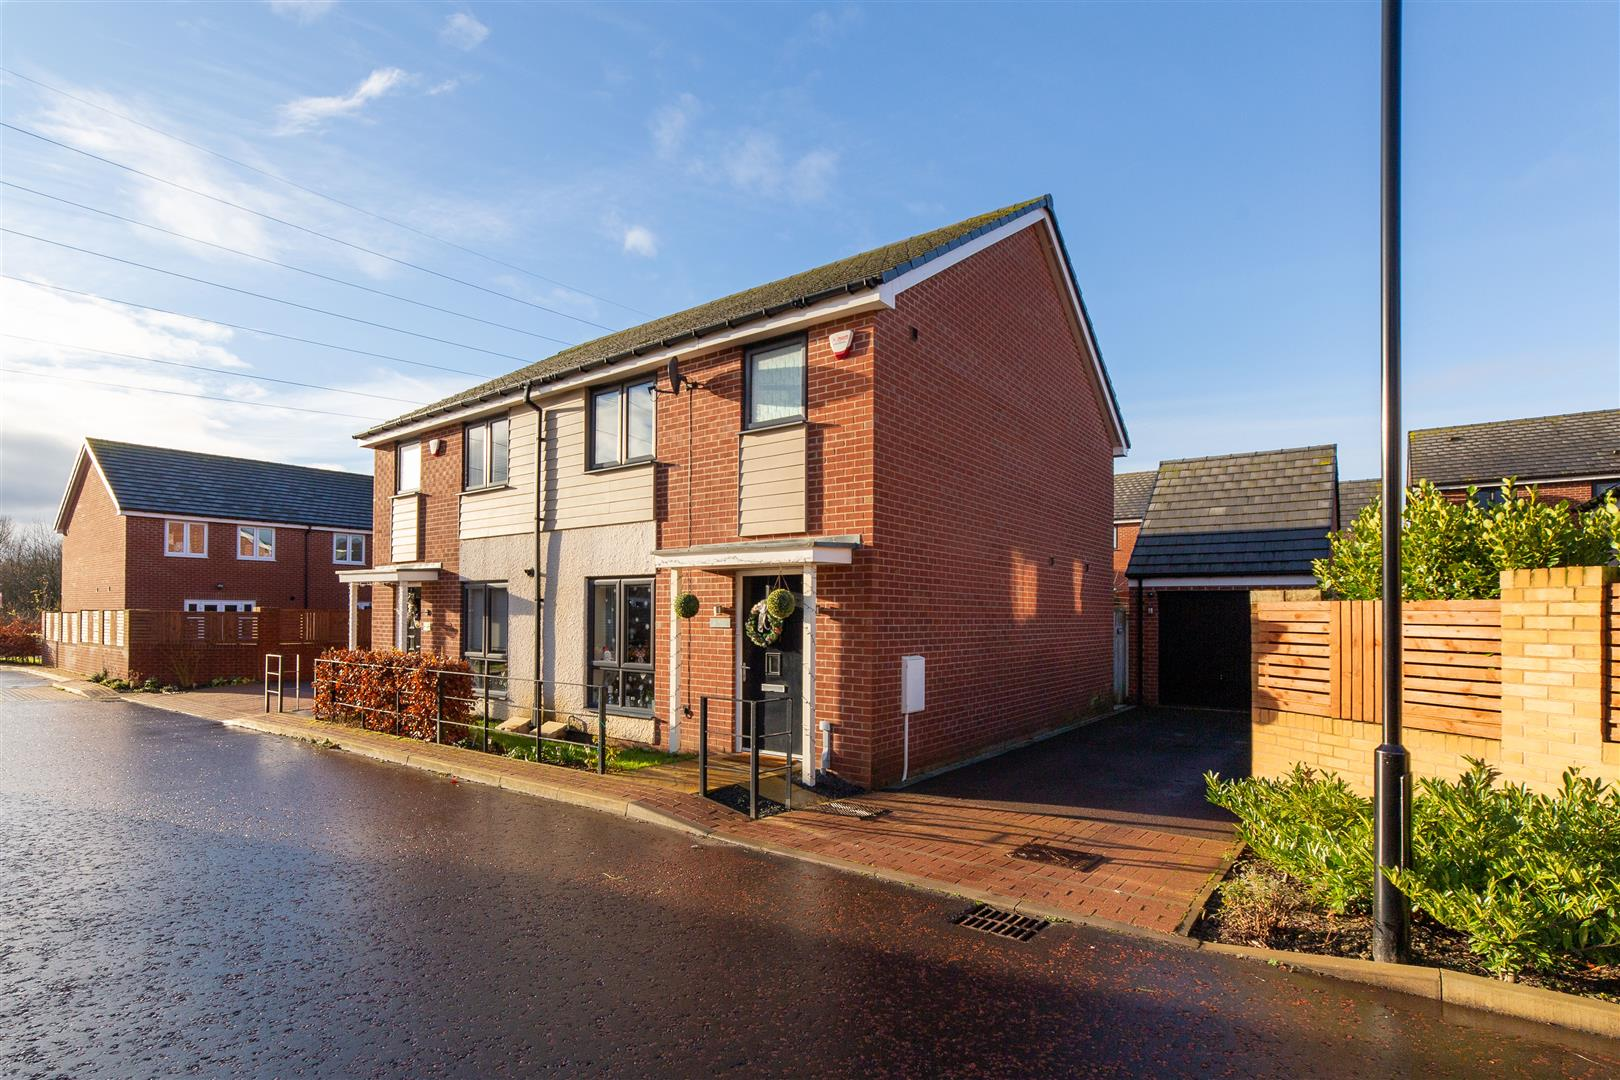 3 bed semi-detached house to rent in Newcastle Upon Tyne, NE13 9DE, NE13